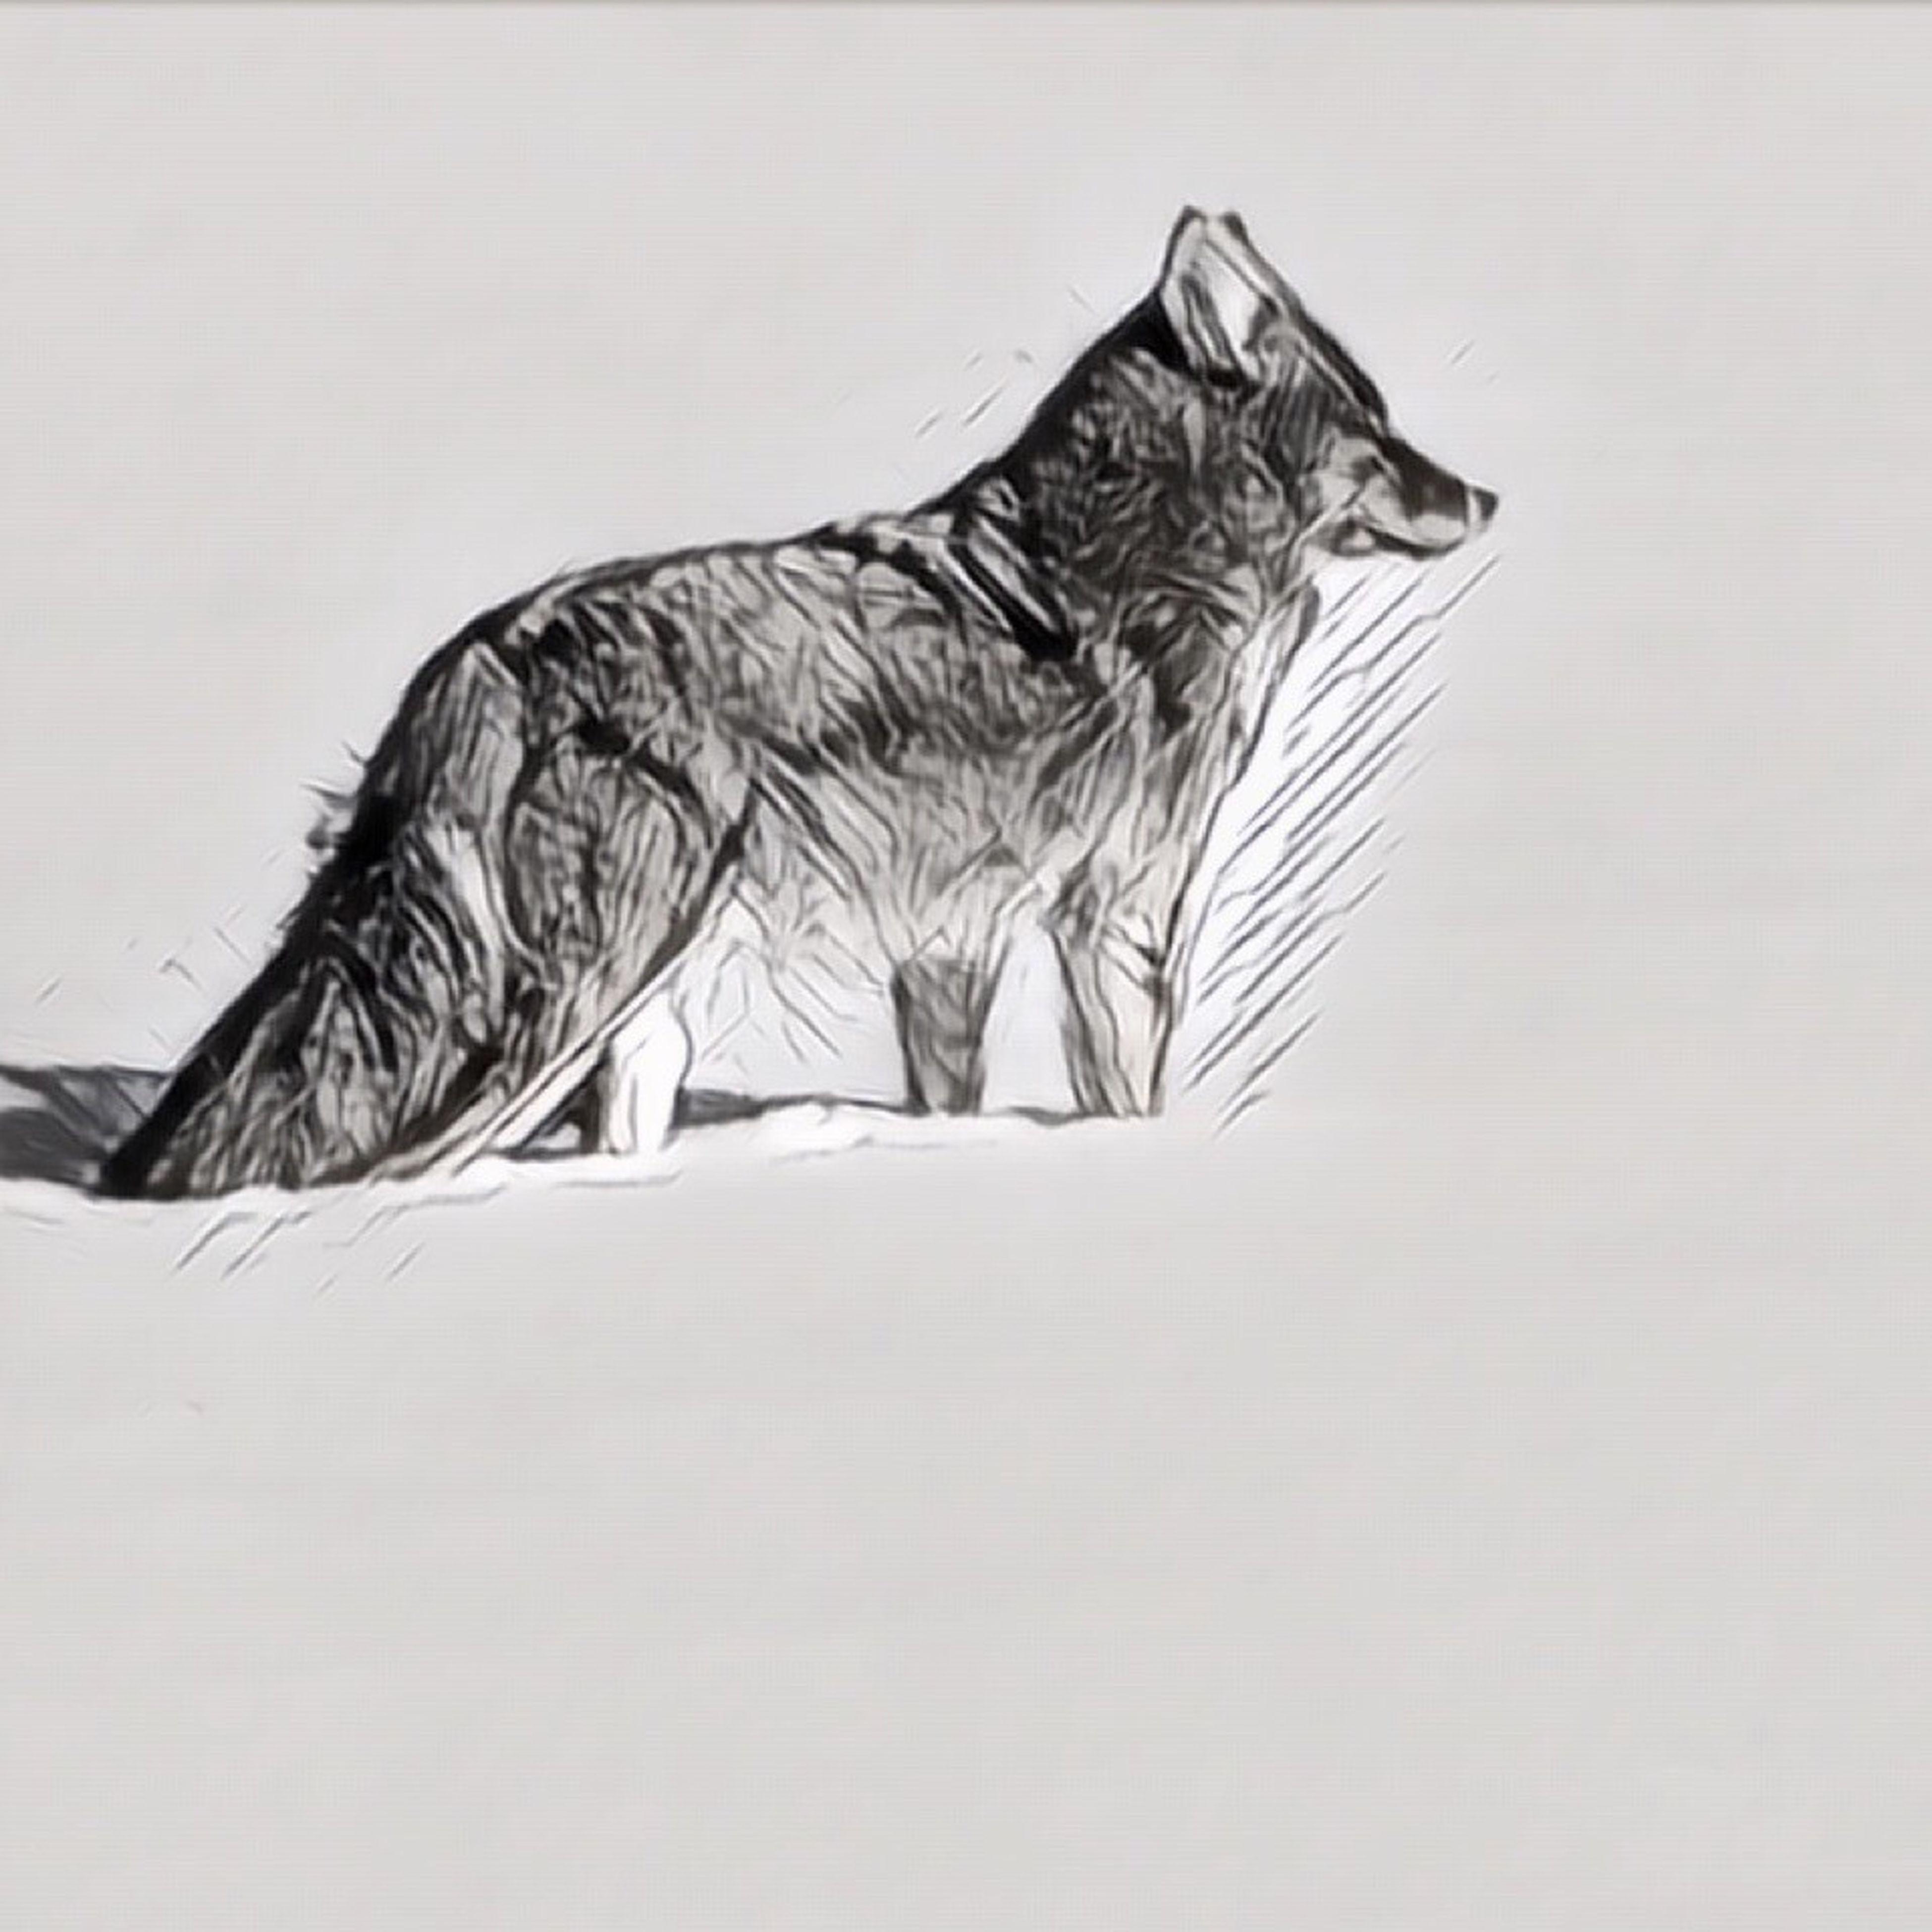 Yellowstone fox Animals In The Wild